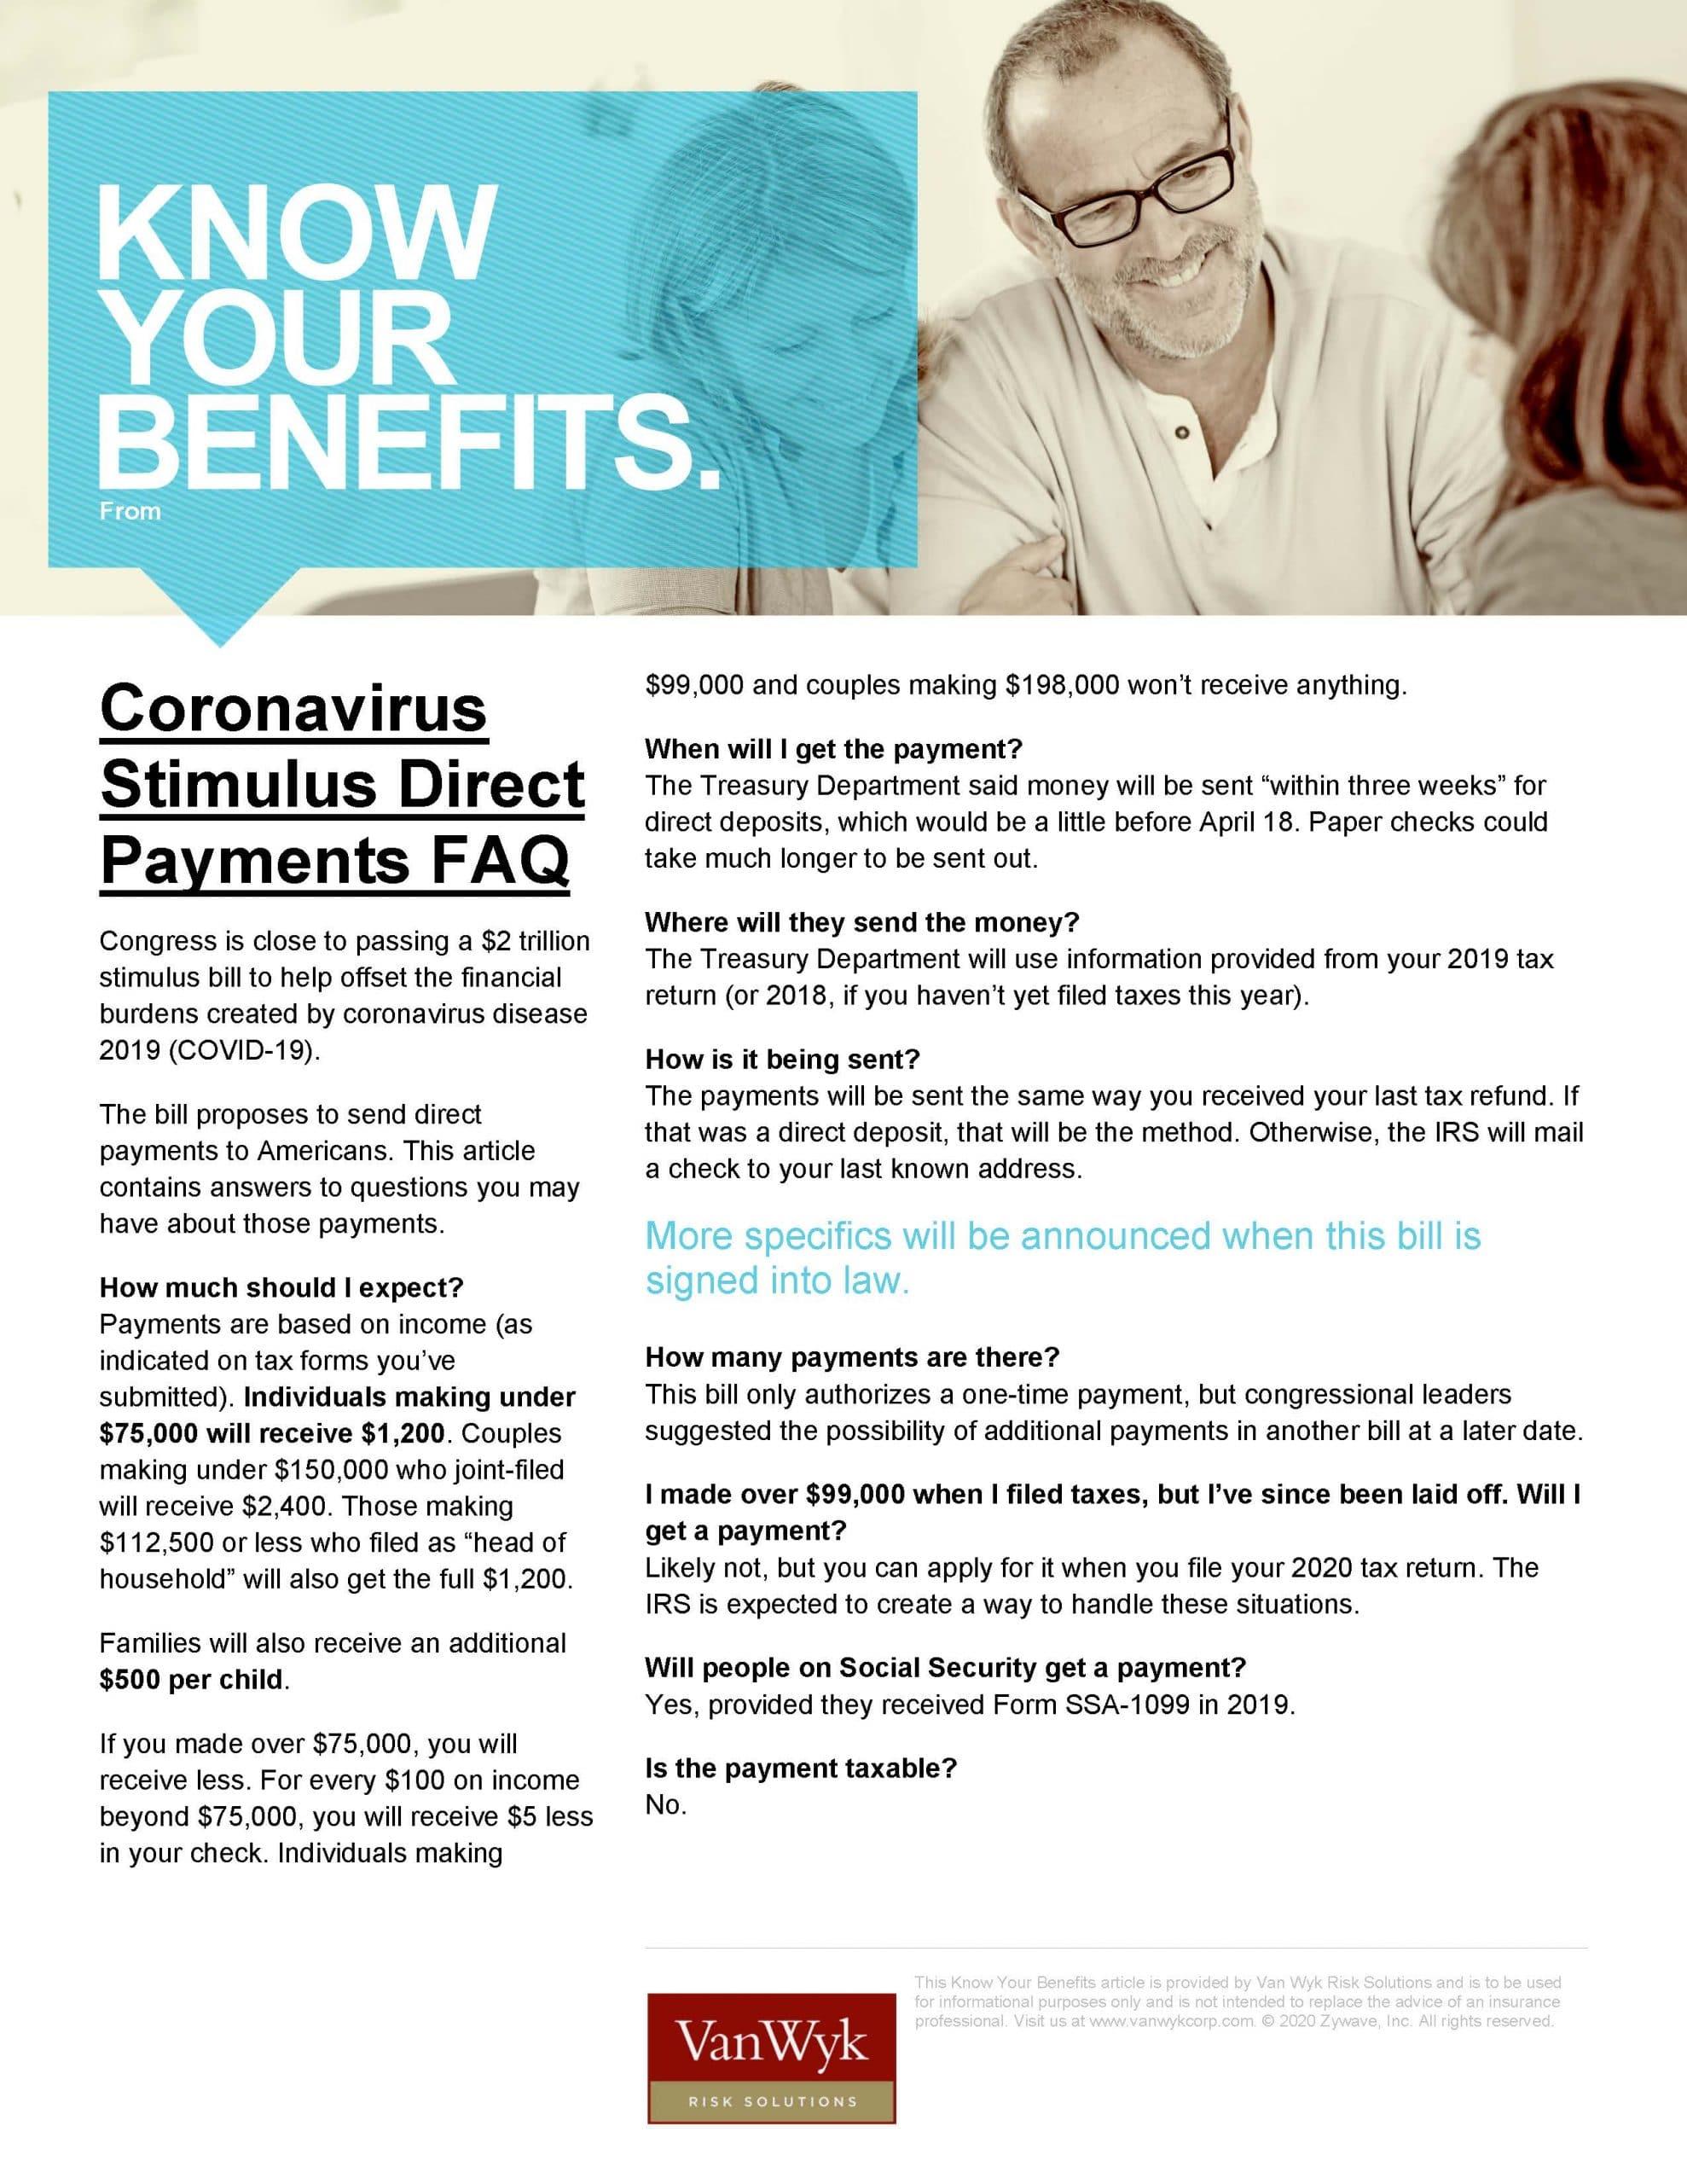 Coronavirus Stimulus Direct Payments FAQ